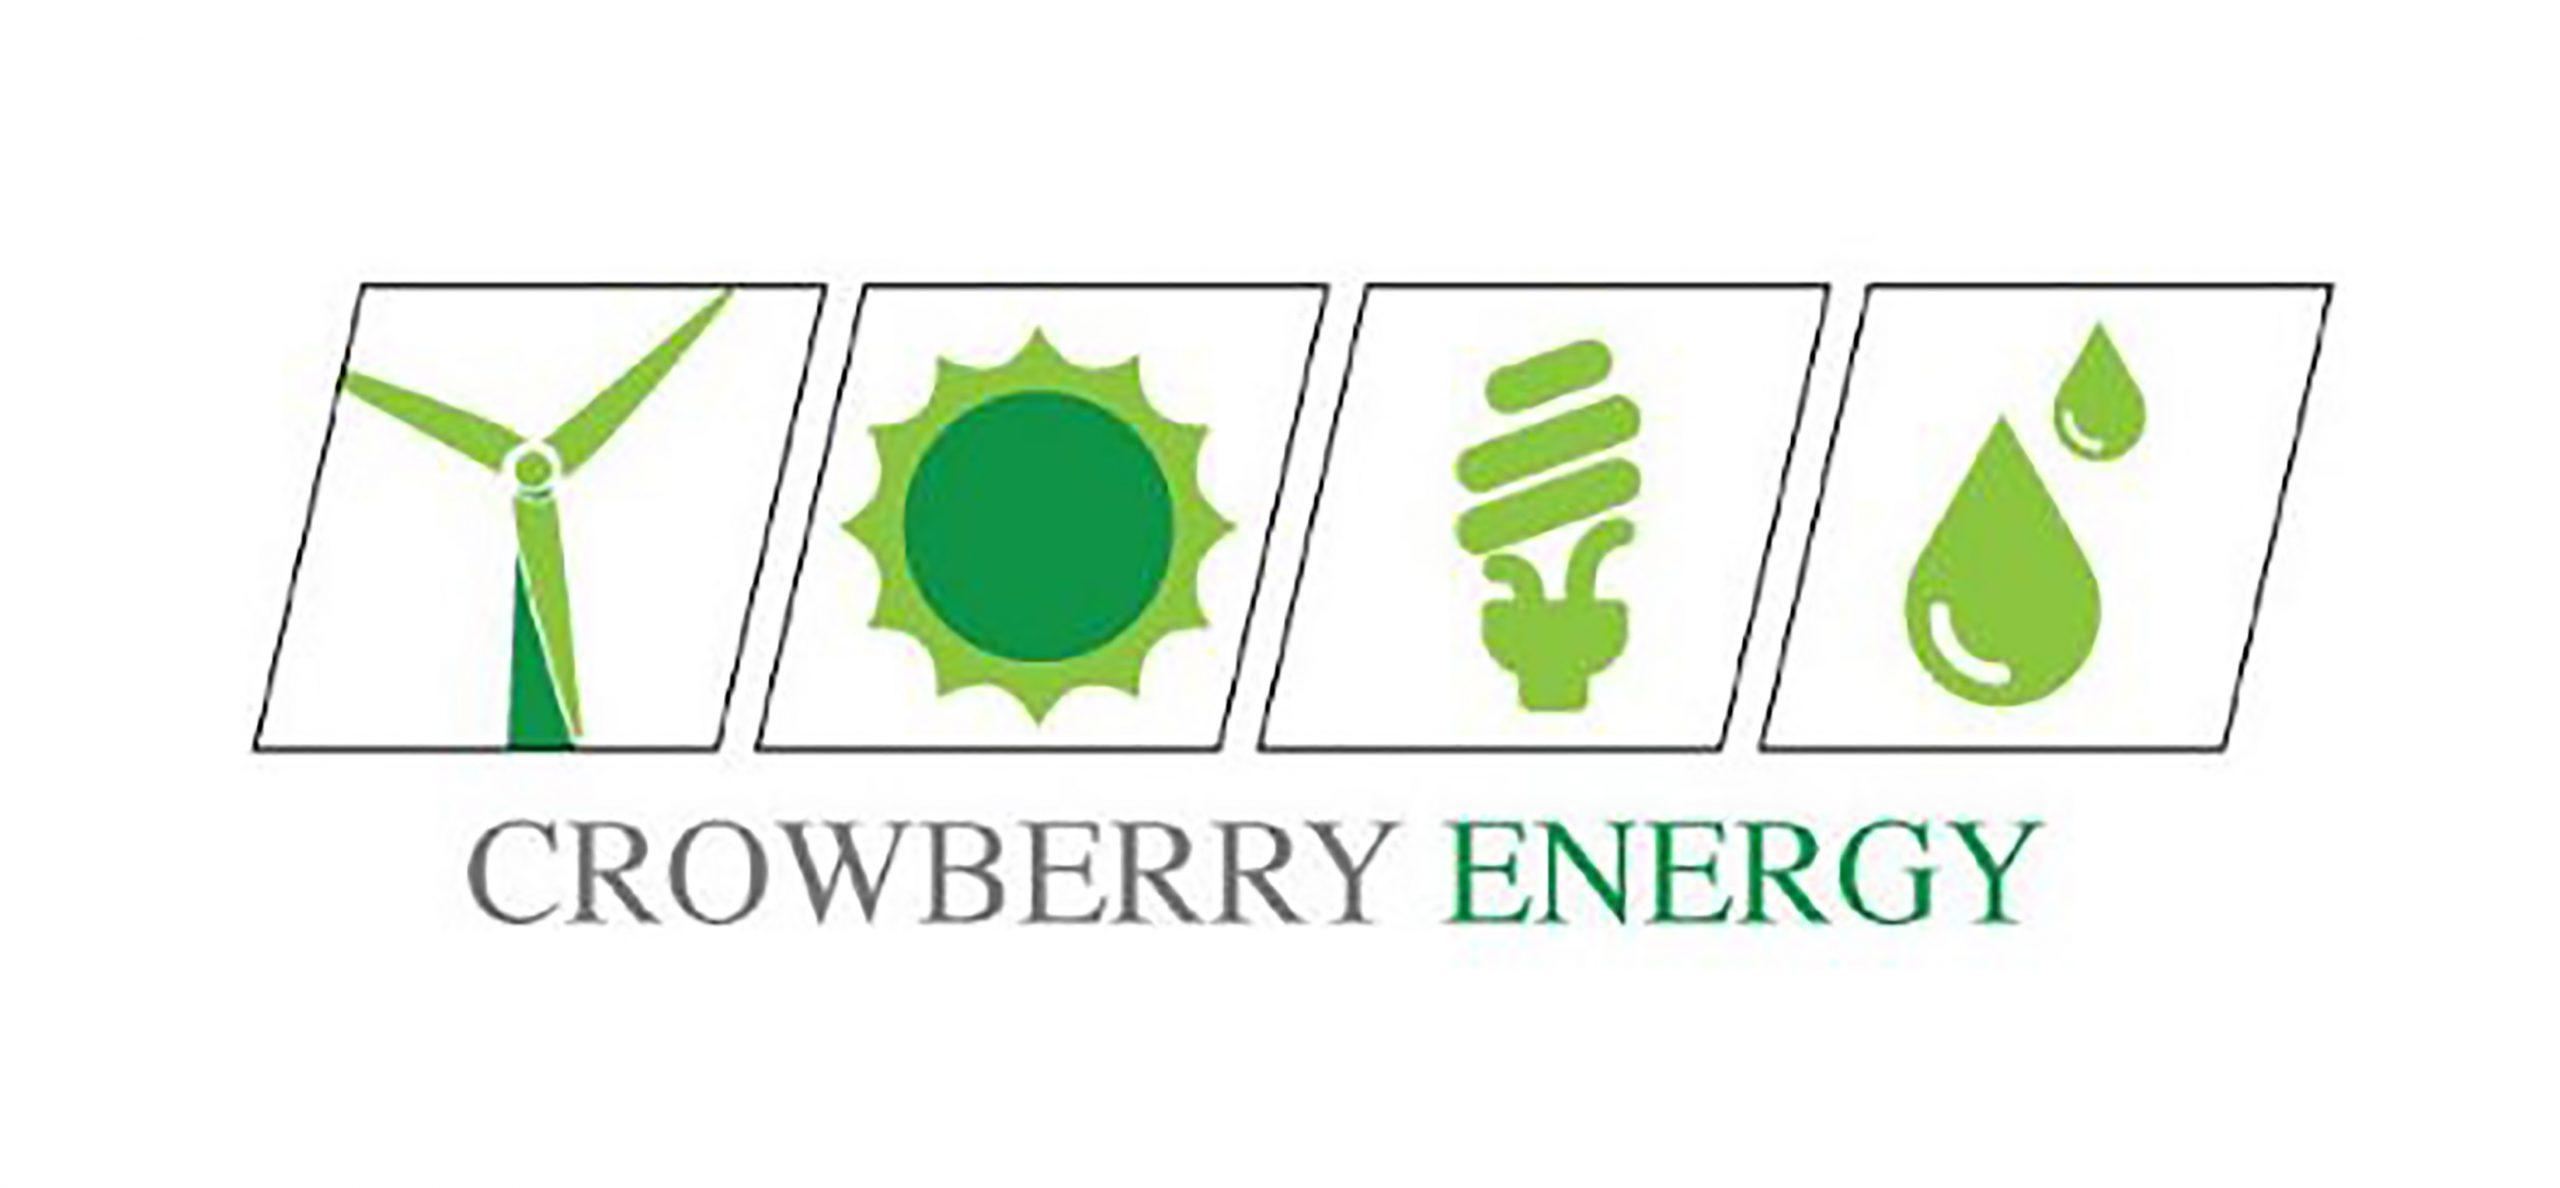 Crowberry Energy